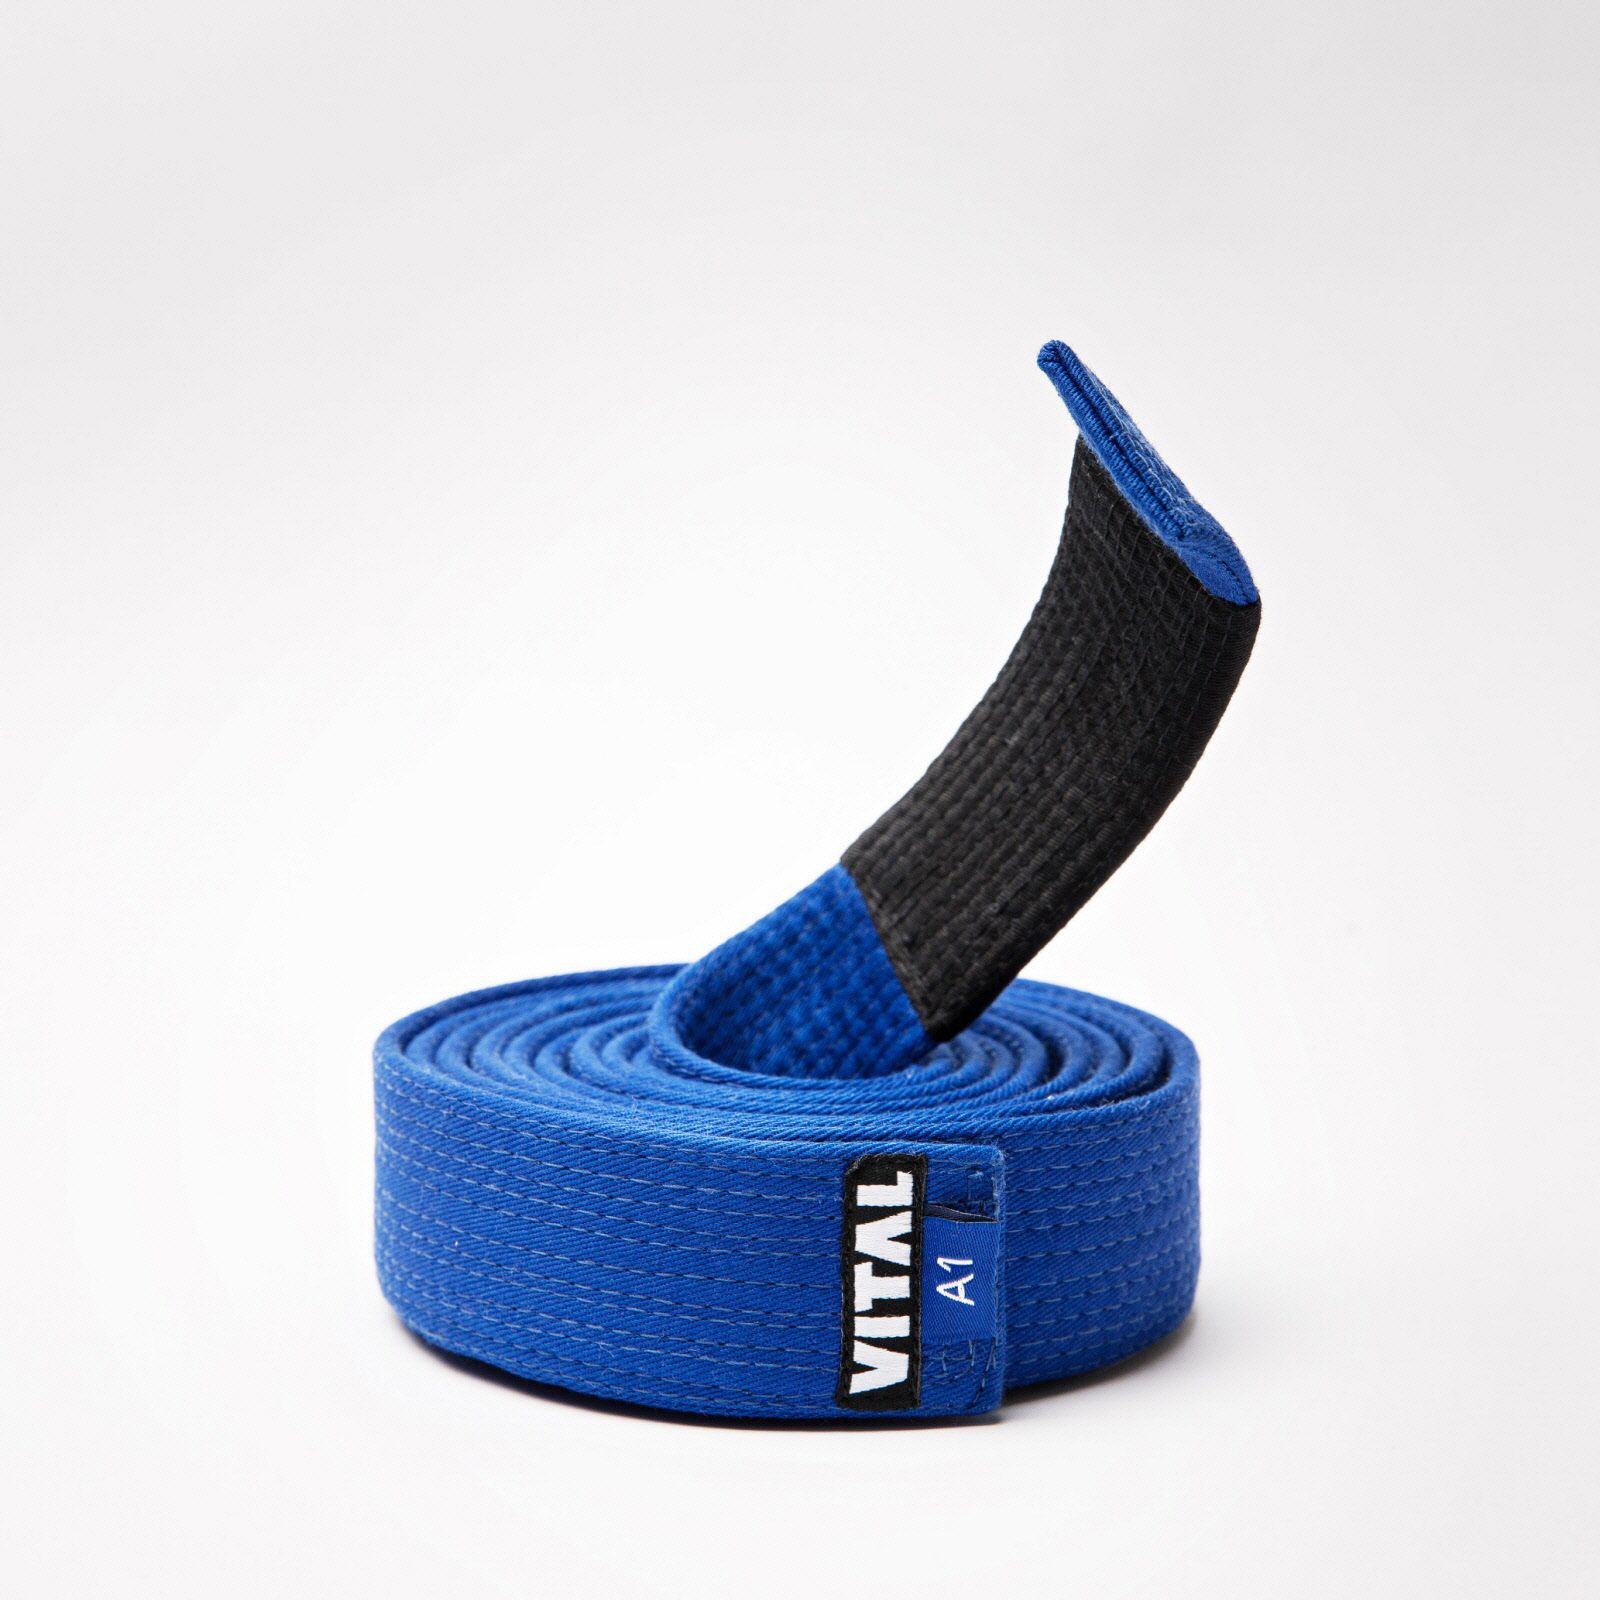 02Vital Premium Belt - AZUL